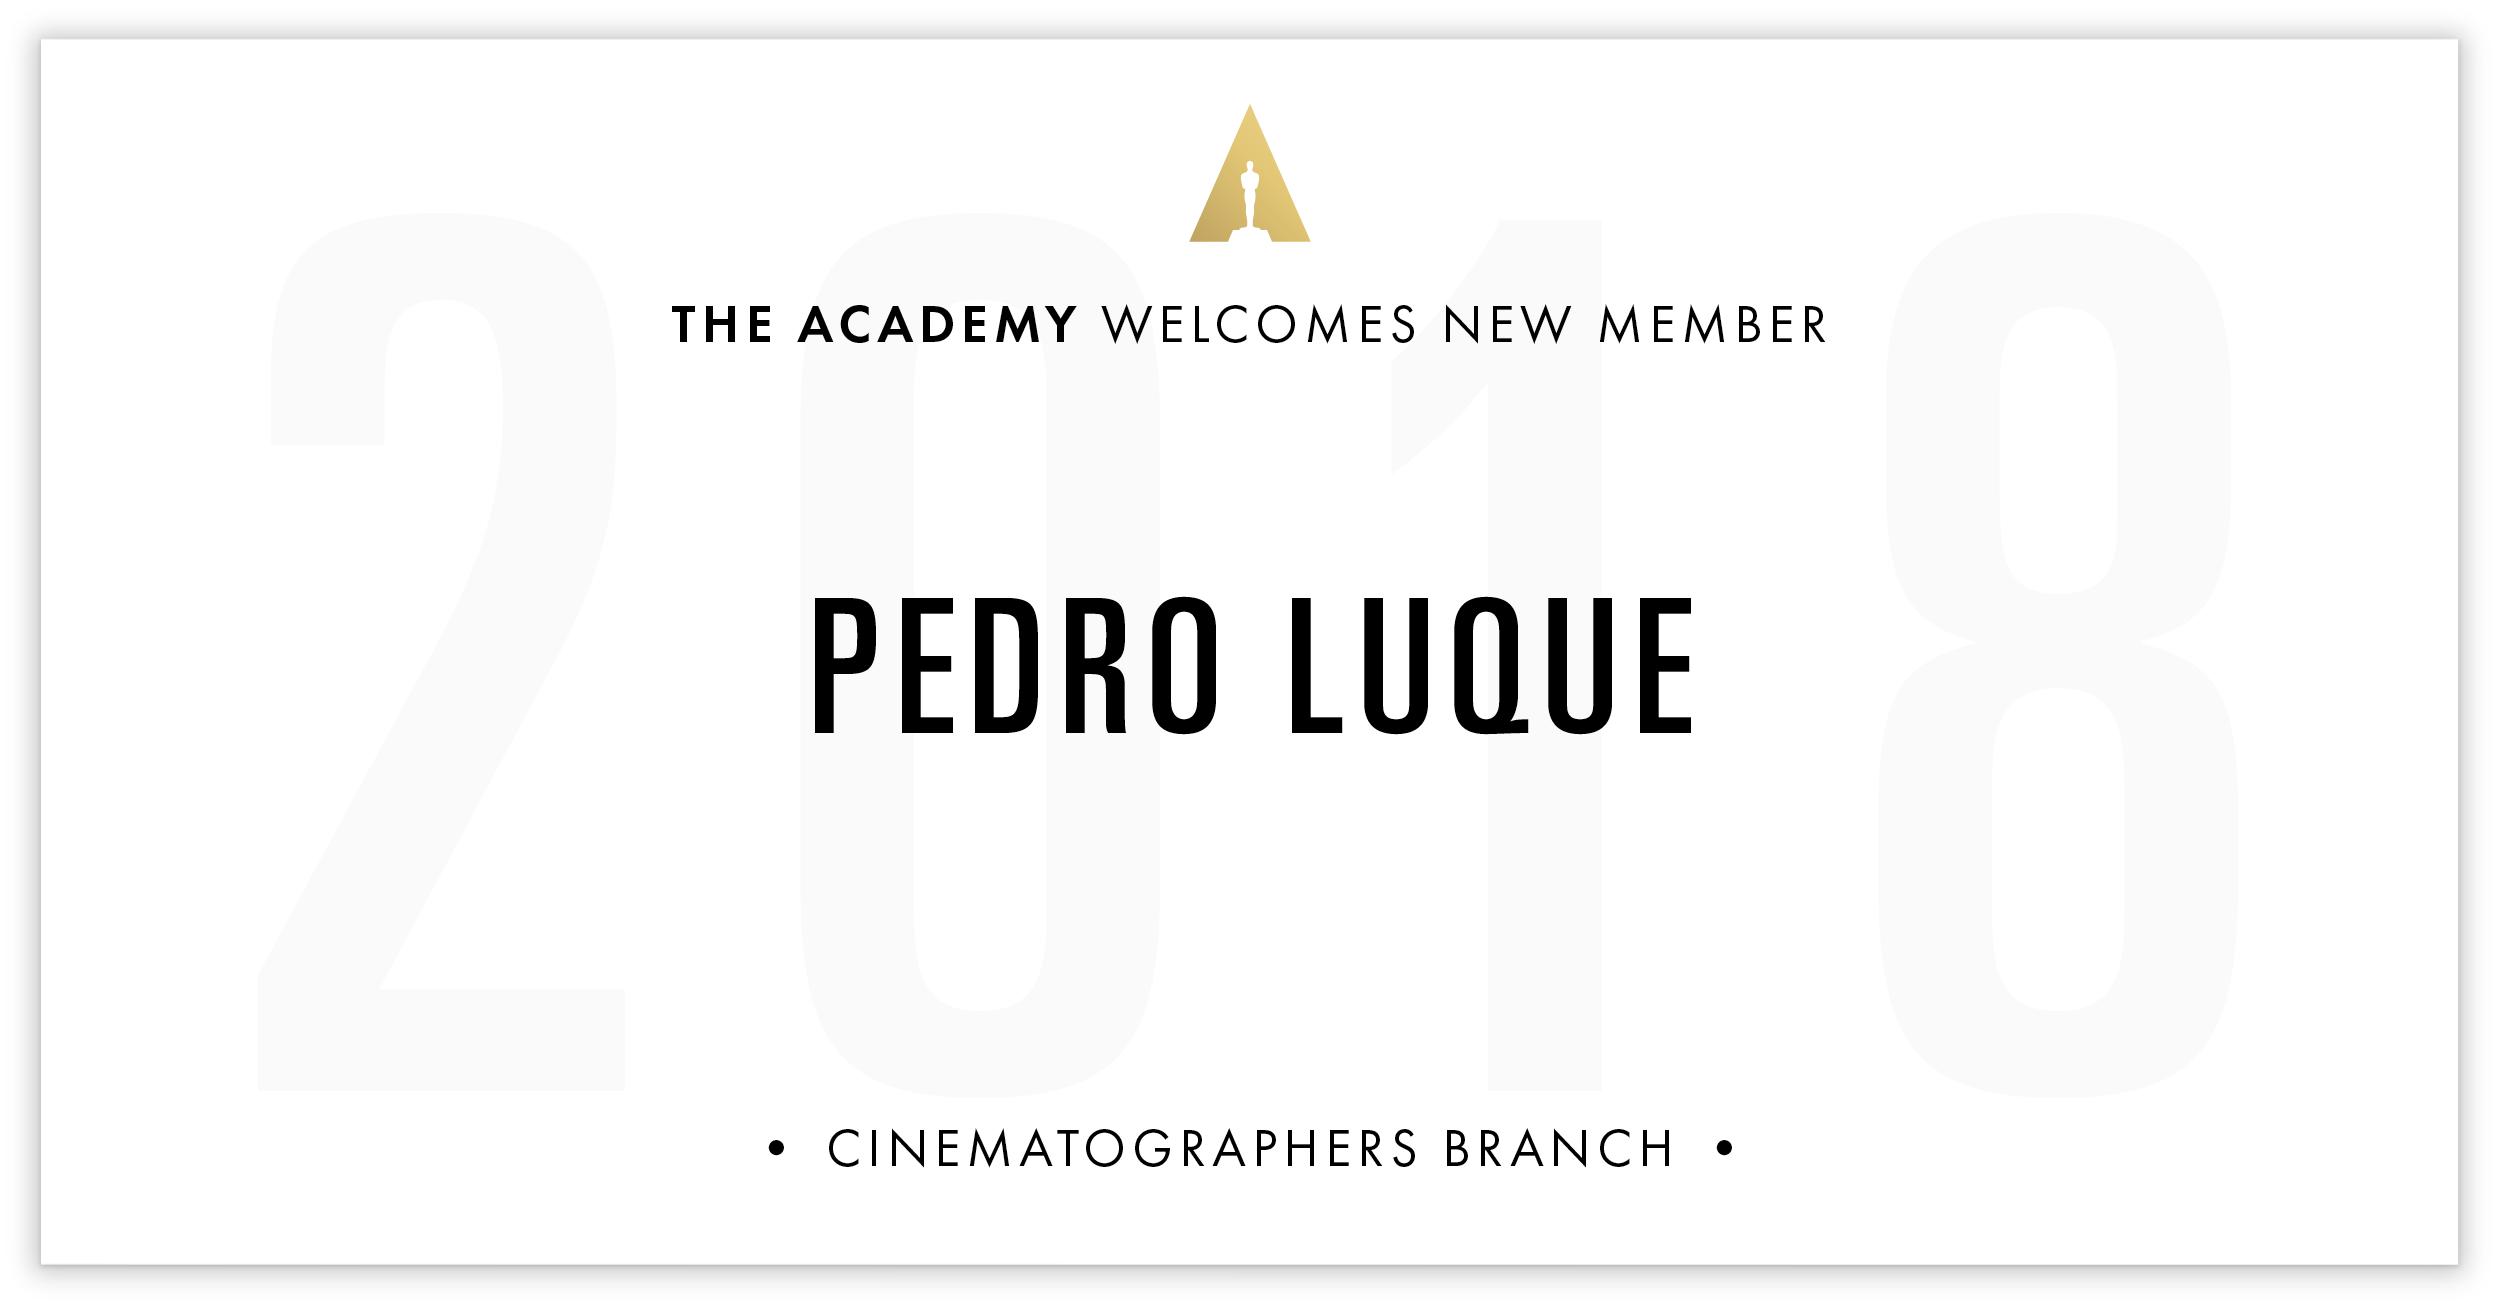 Pedro Luque is invited!